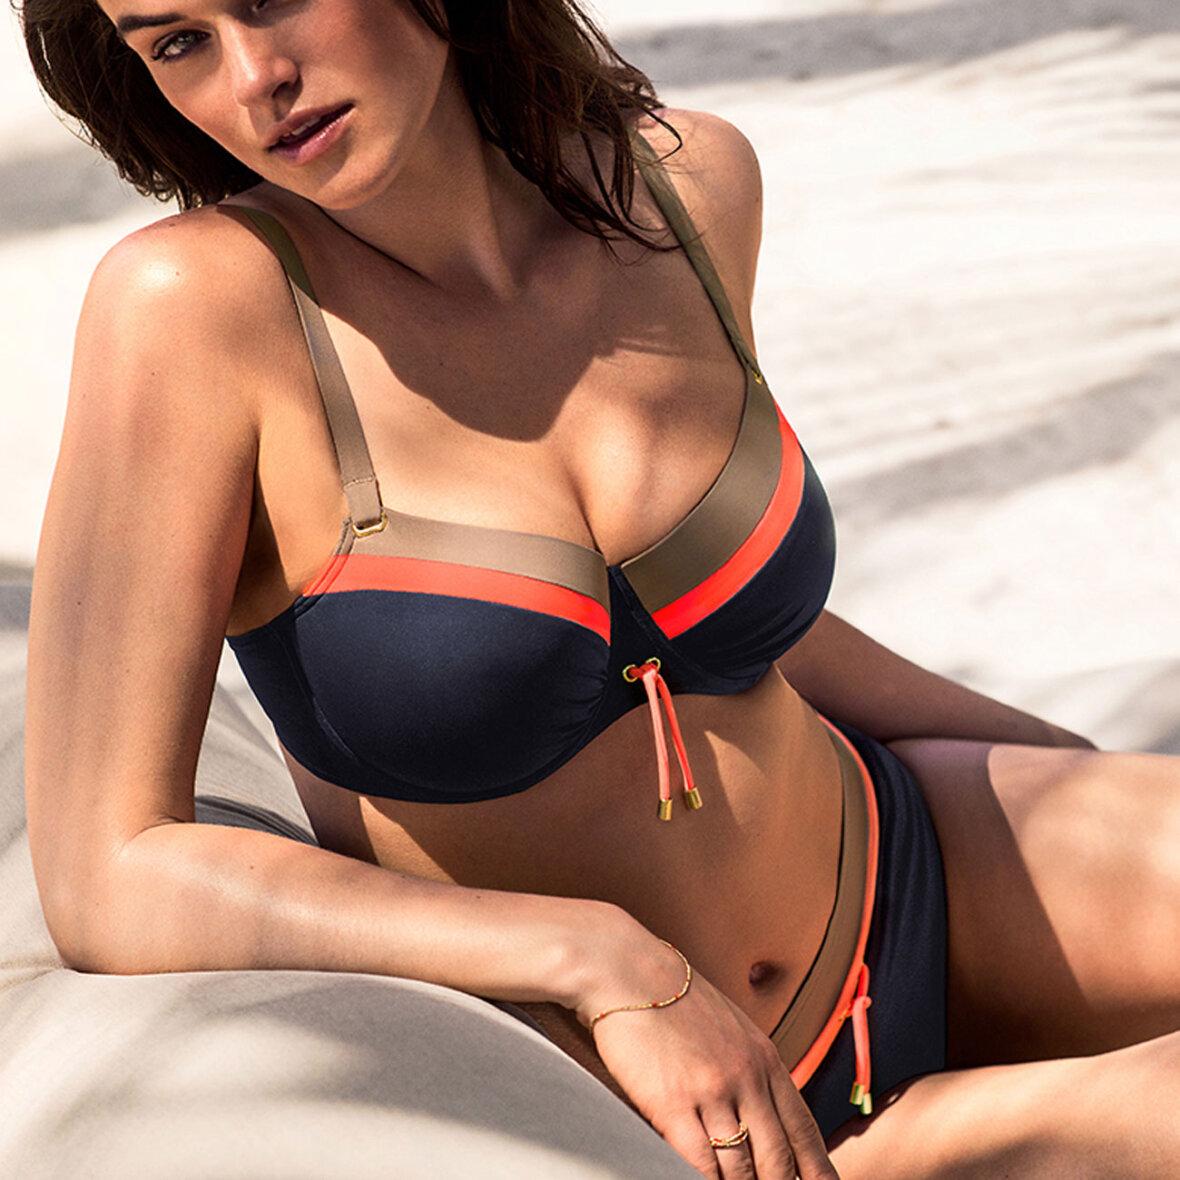 e3491a12362 Anne Sax - Bikinitop med bøjle - PrimaDonna - Ocean Drive bikinitop ...